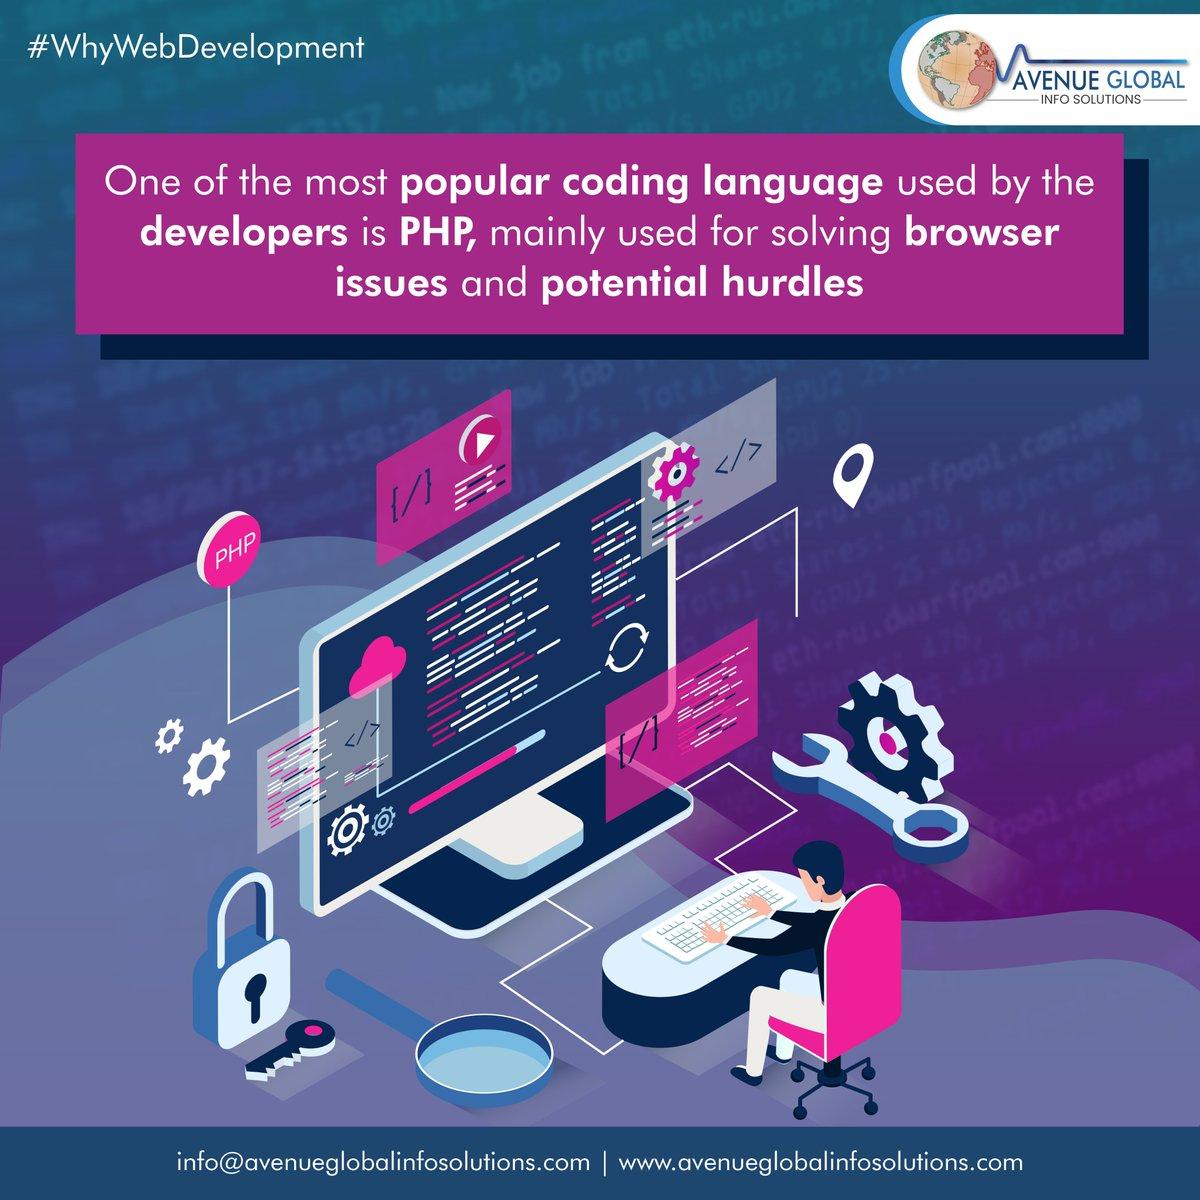 One of the most used language use by Developers is PHP!  #whywebdevelopment #webdesigncompany #websitedeveloper #webdesigntips #instatech #instatechno #socialmediamarketing #Avenueglobalinfosolutions #avenueglobal #AGIS #Webdesigning #Digitalmarketing #Websitedevelopmentpic.twitter.com/ngw3t6TeIj